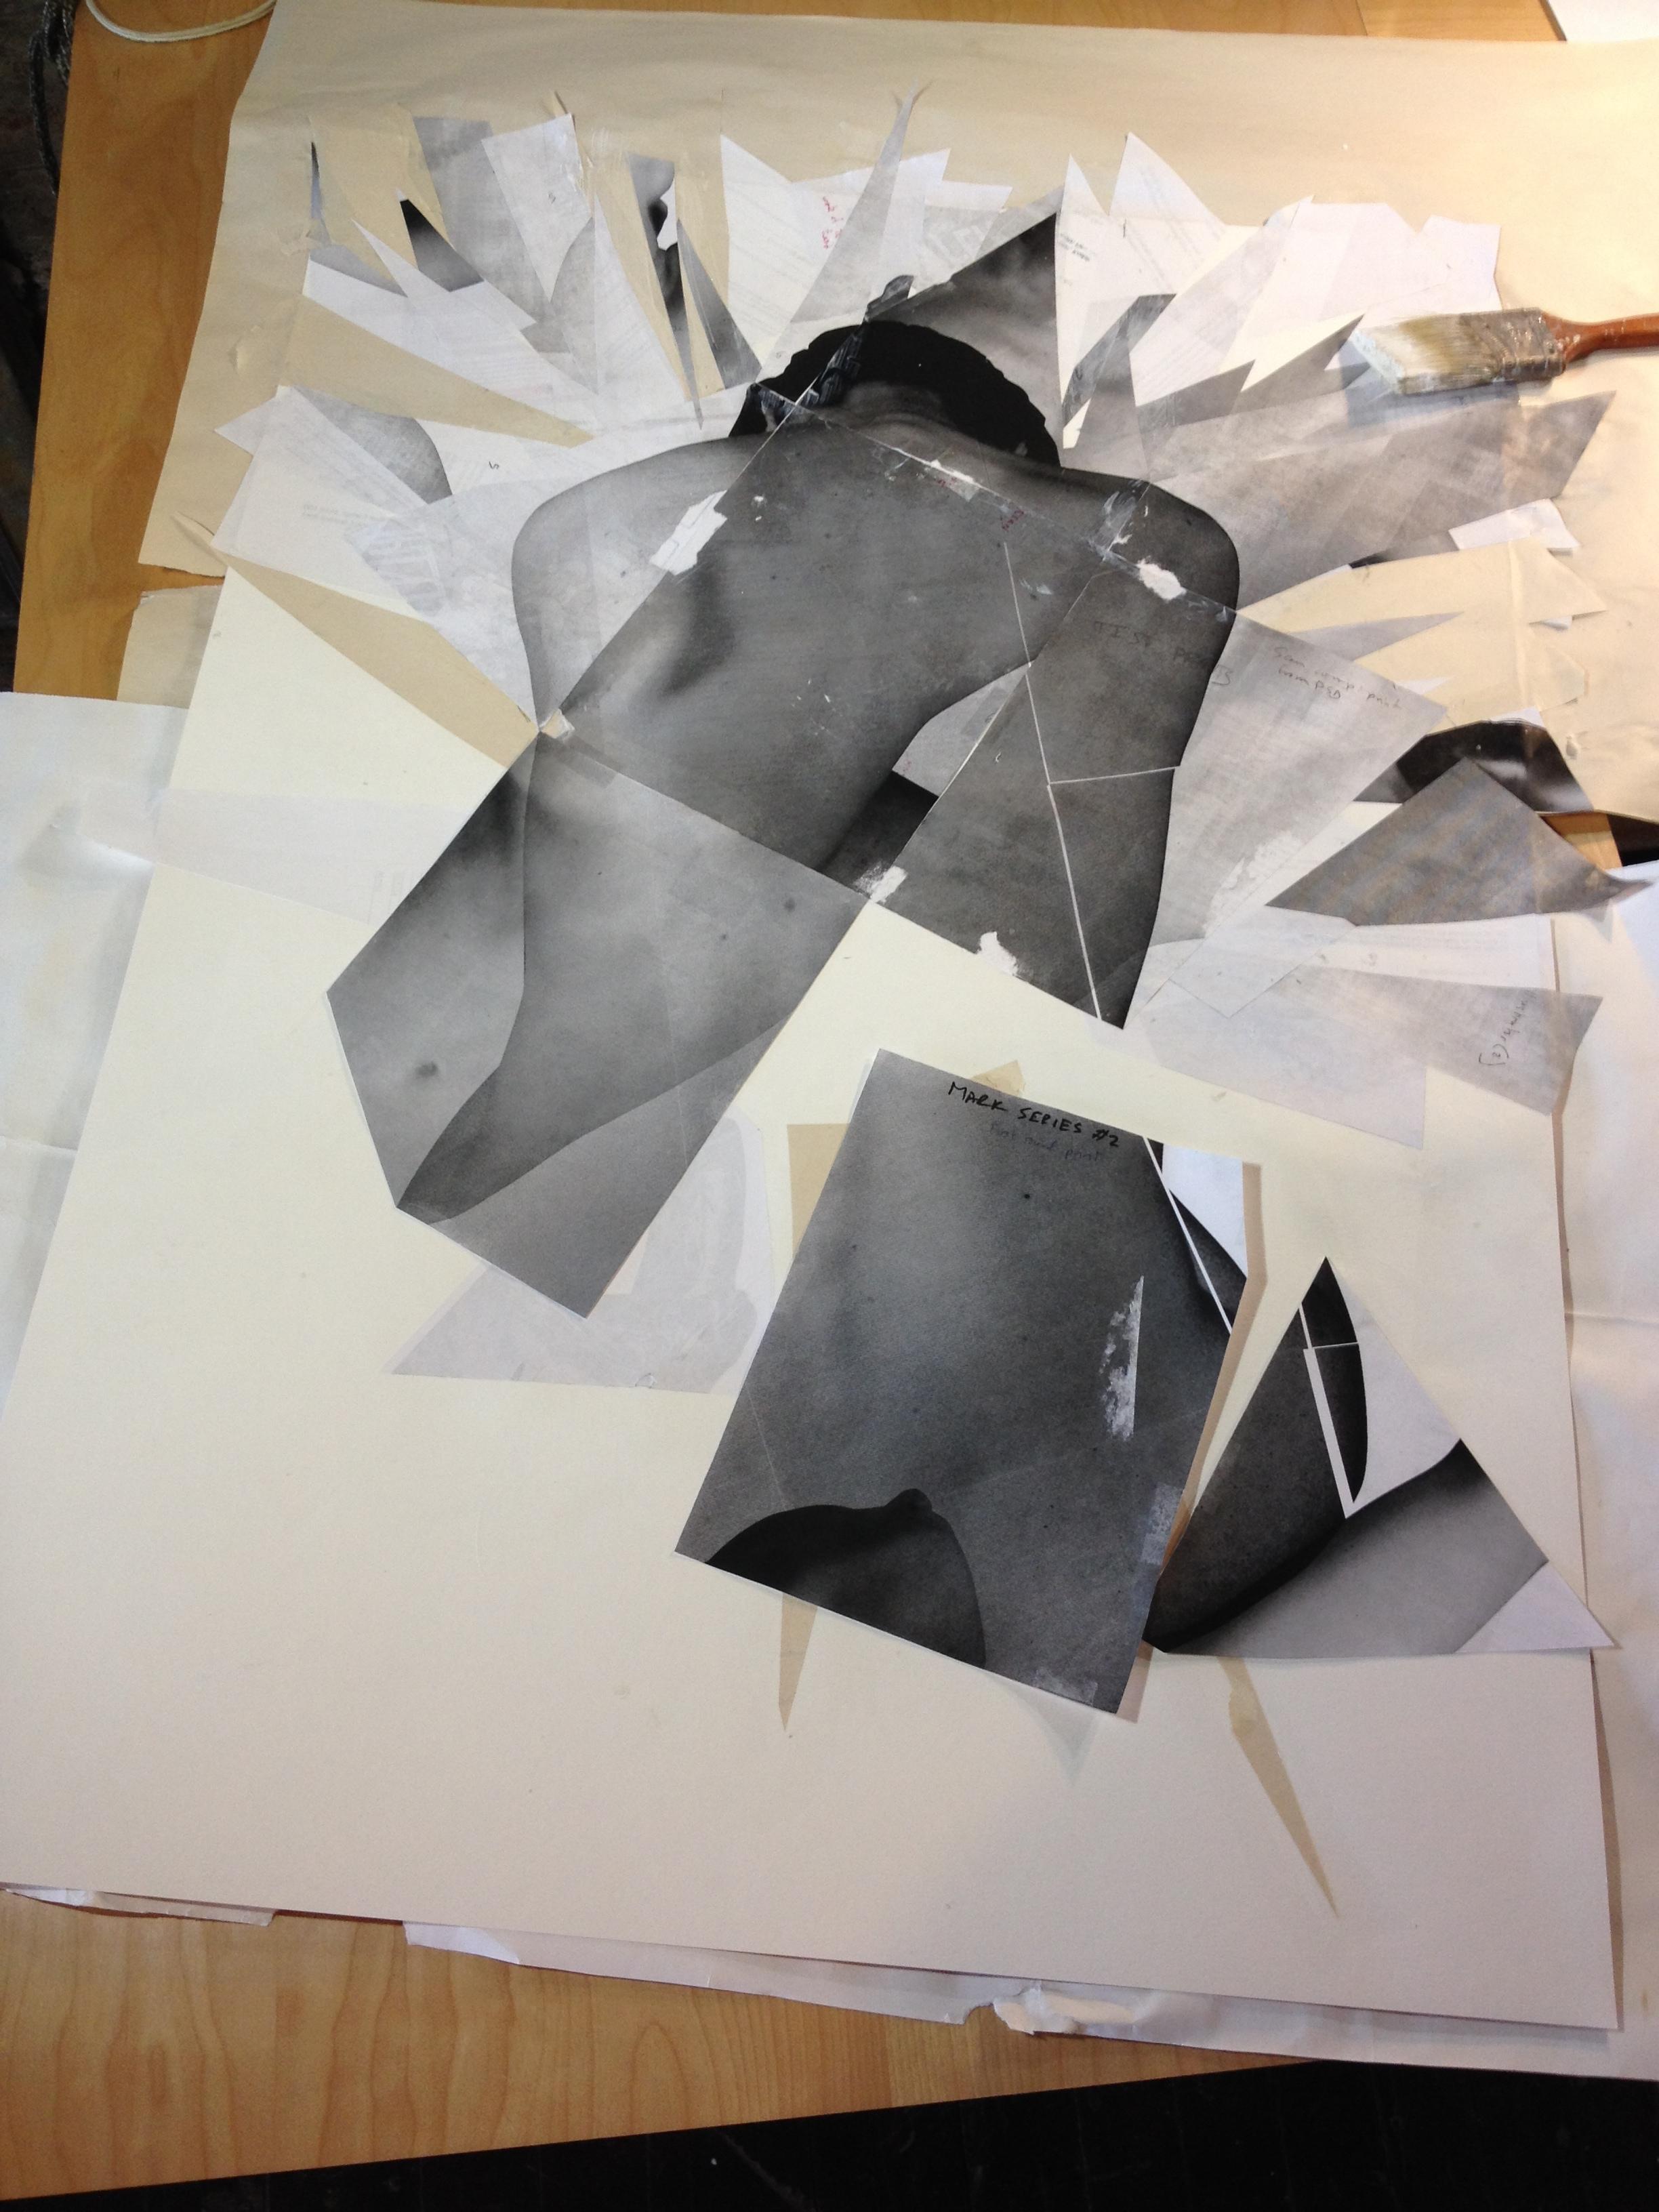 Mark No. 3: Collage in progress